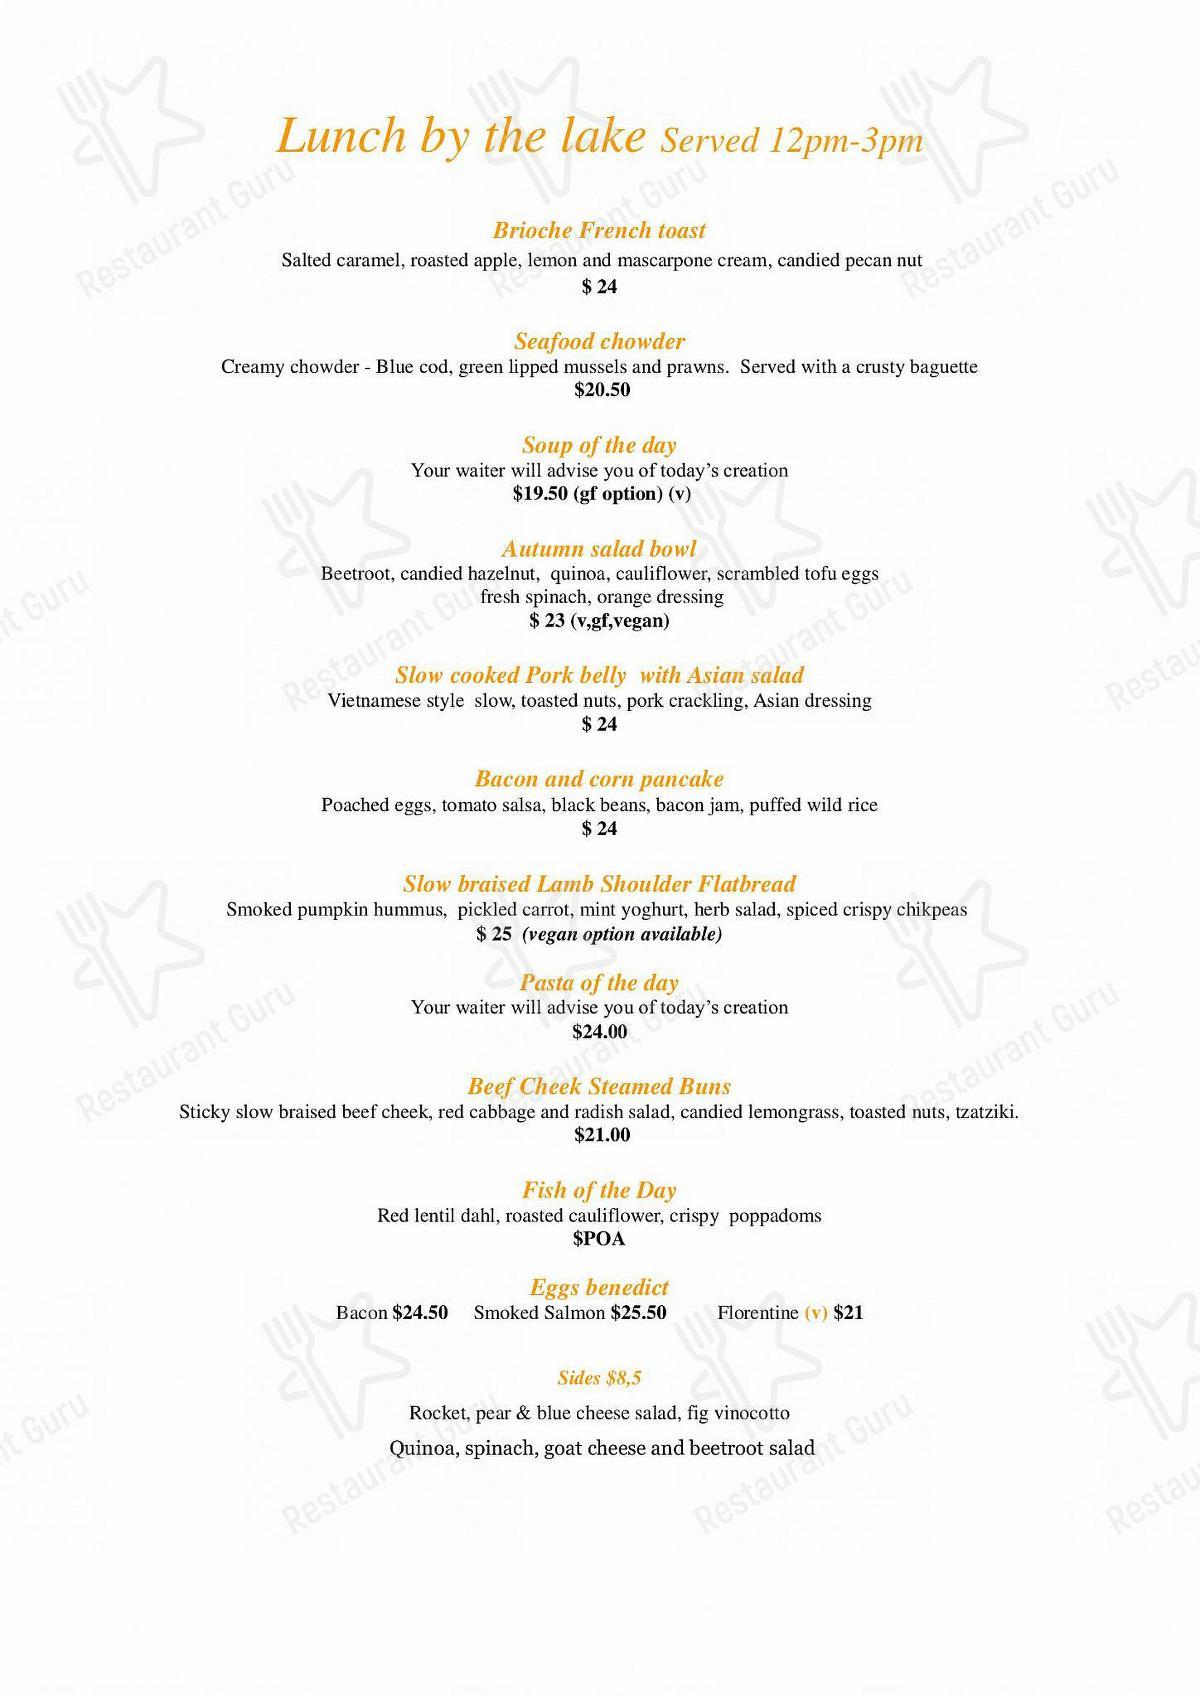 The Bathhouse menu